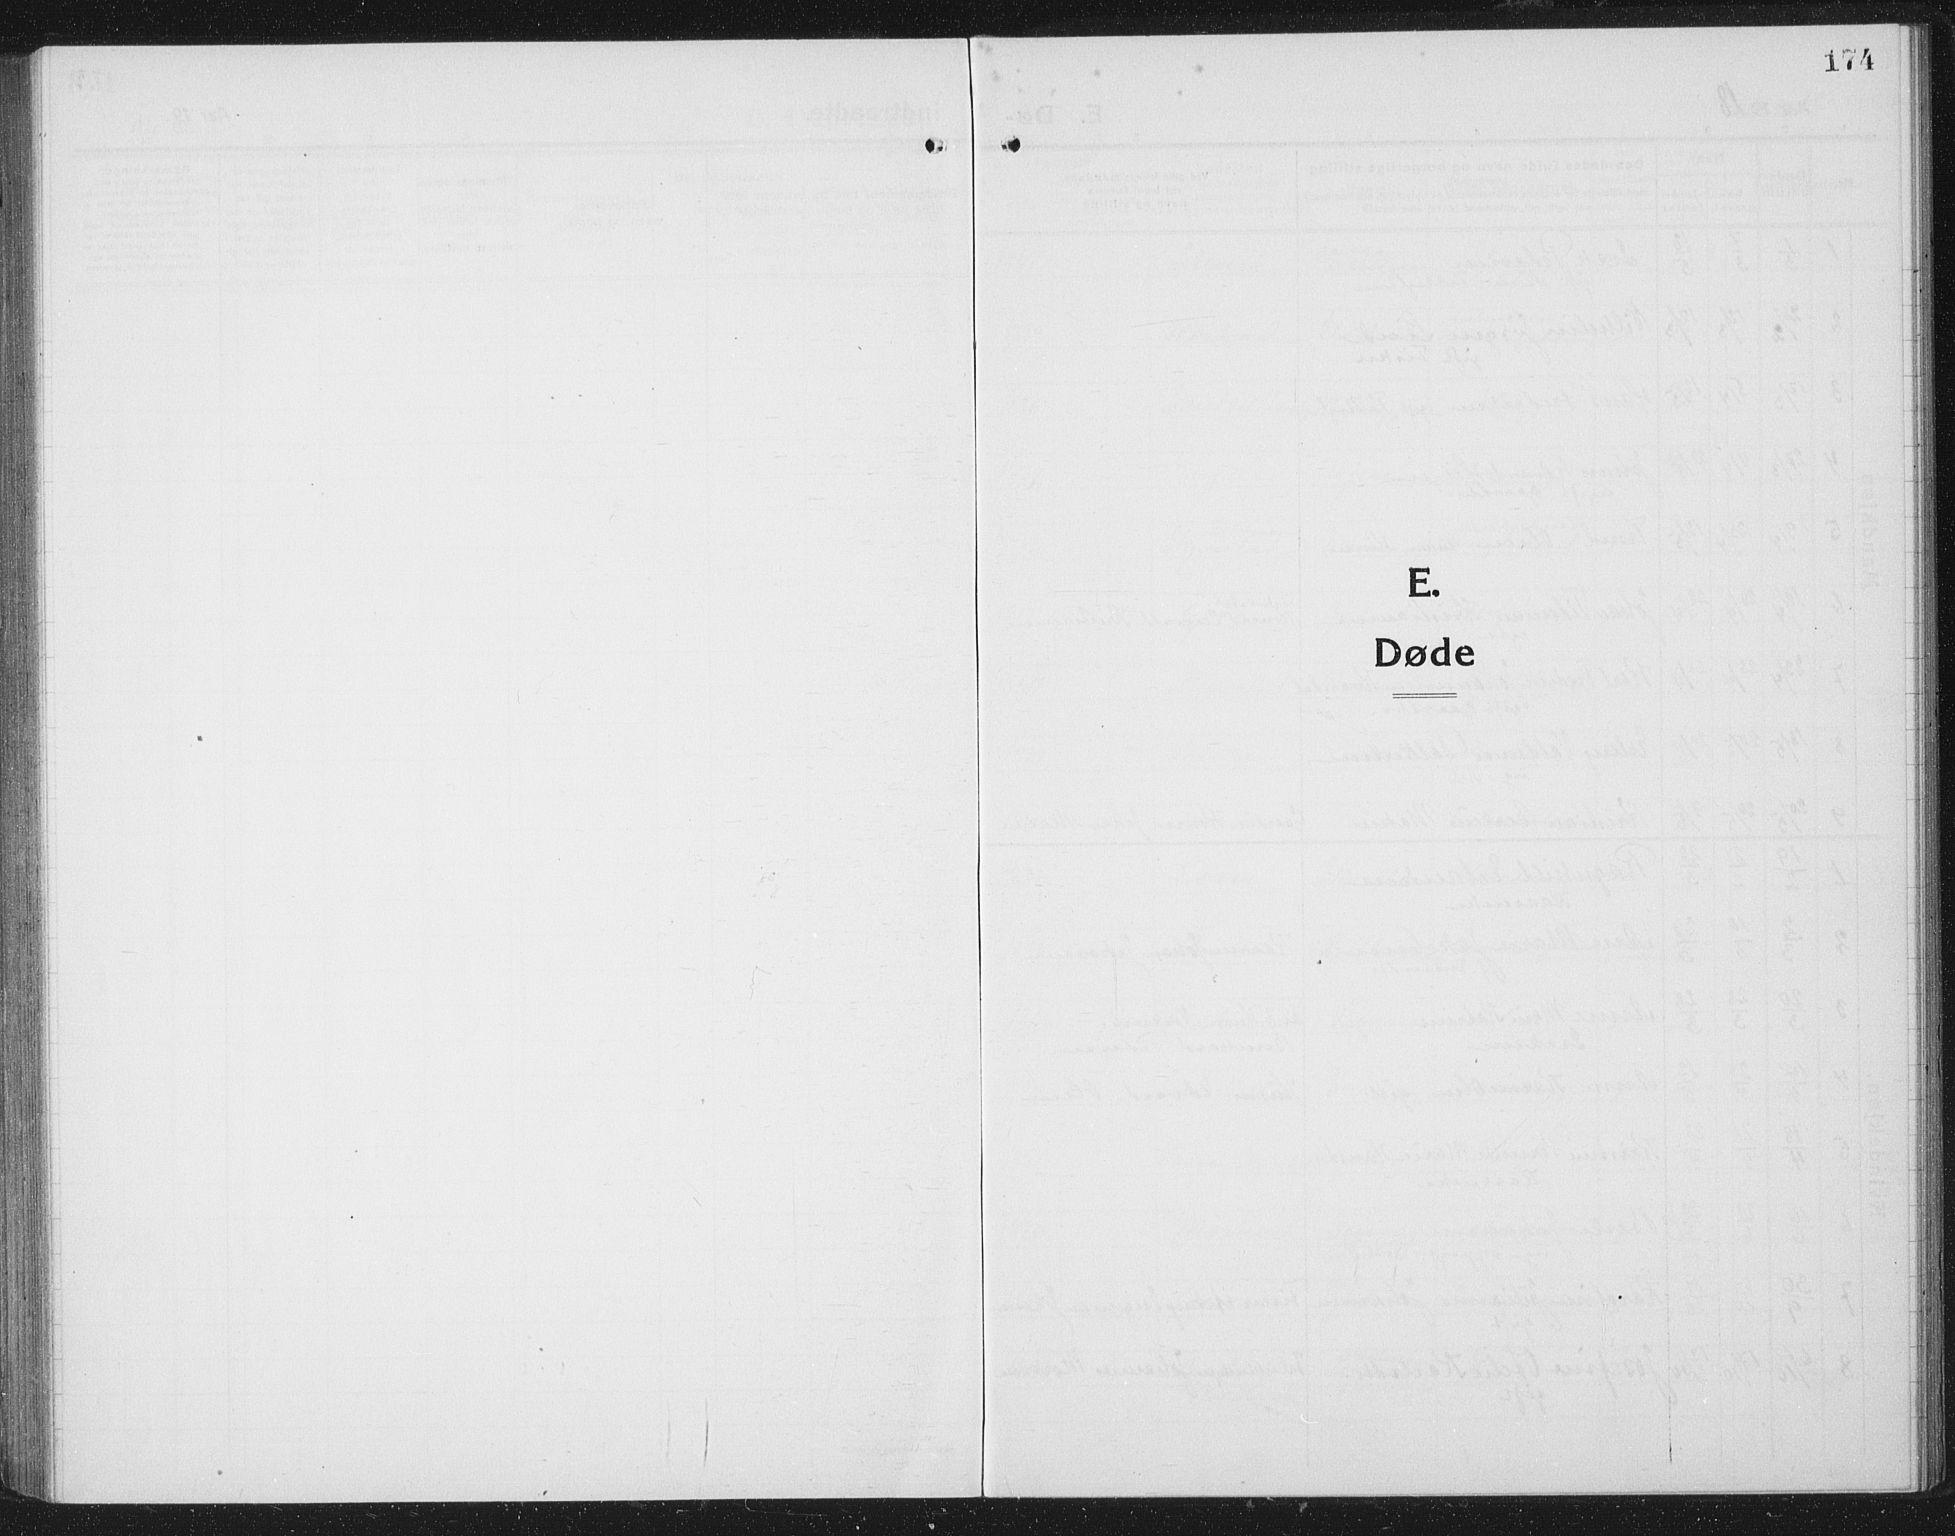 SAT, Ministerialprotokoller, klokkerbøker og fødselsregistre - Nordland, 804/L0089: Klokkerbok nr. 804C02, 1918-1935, s. 174